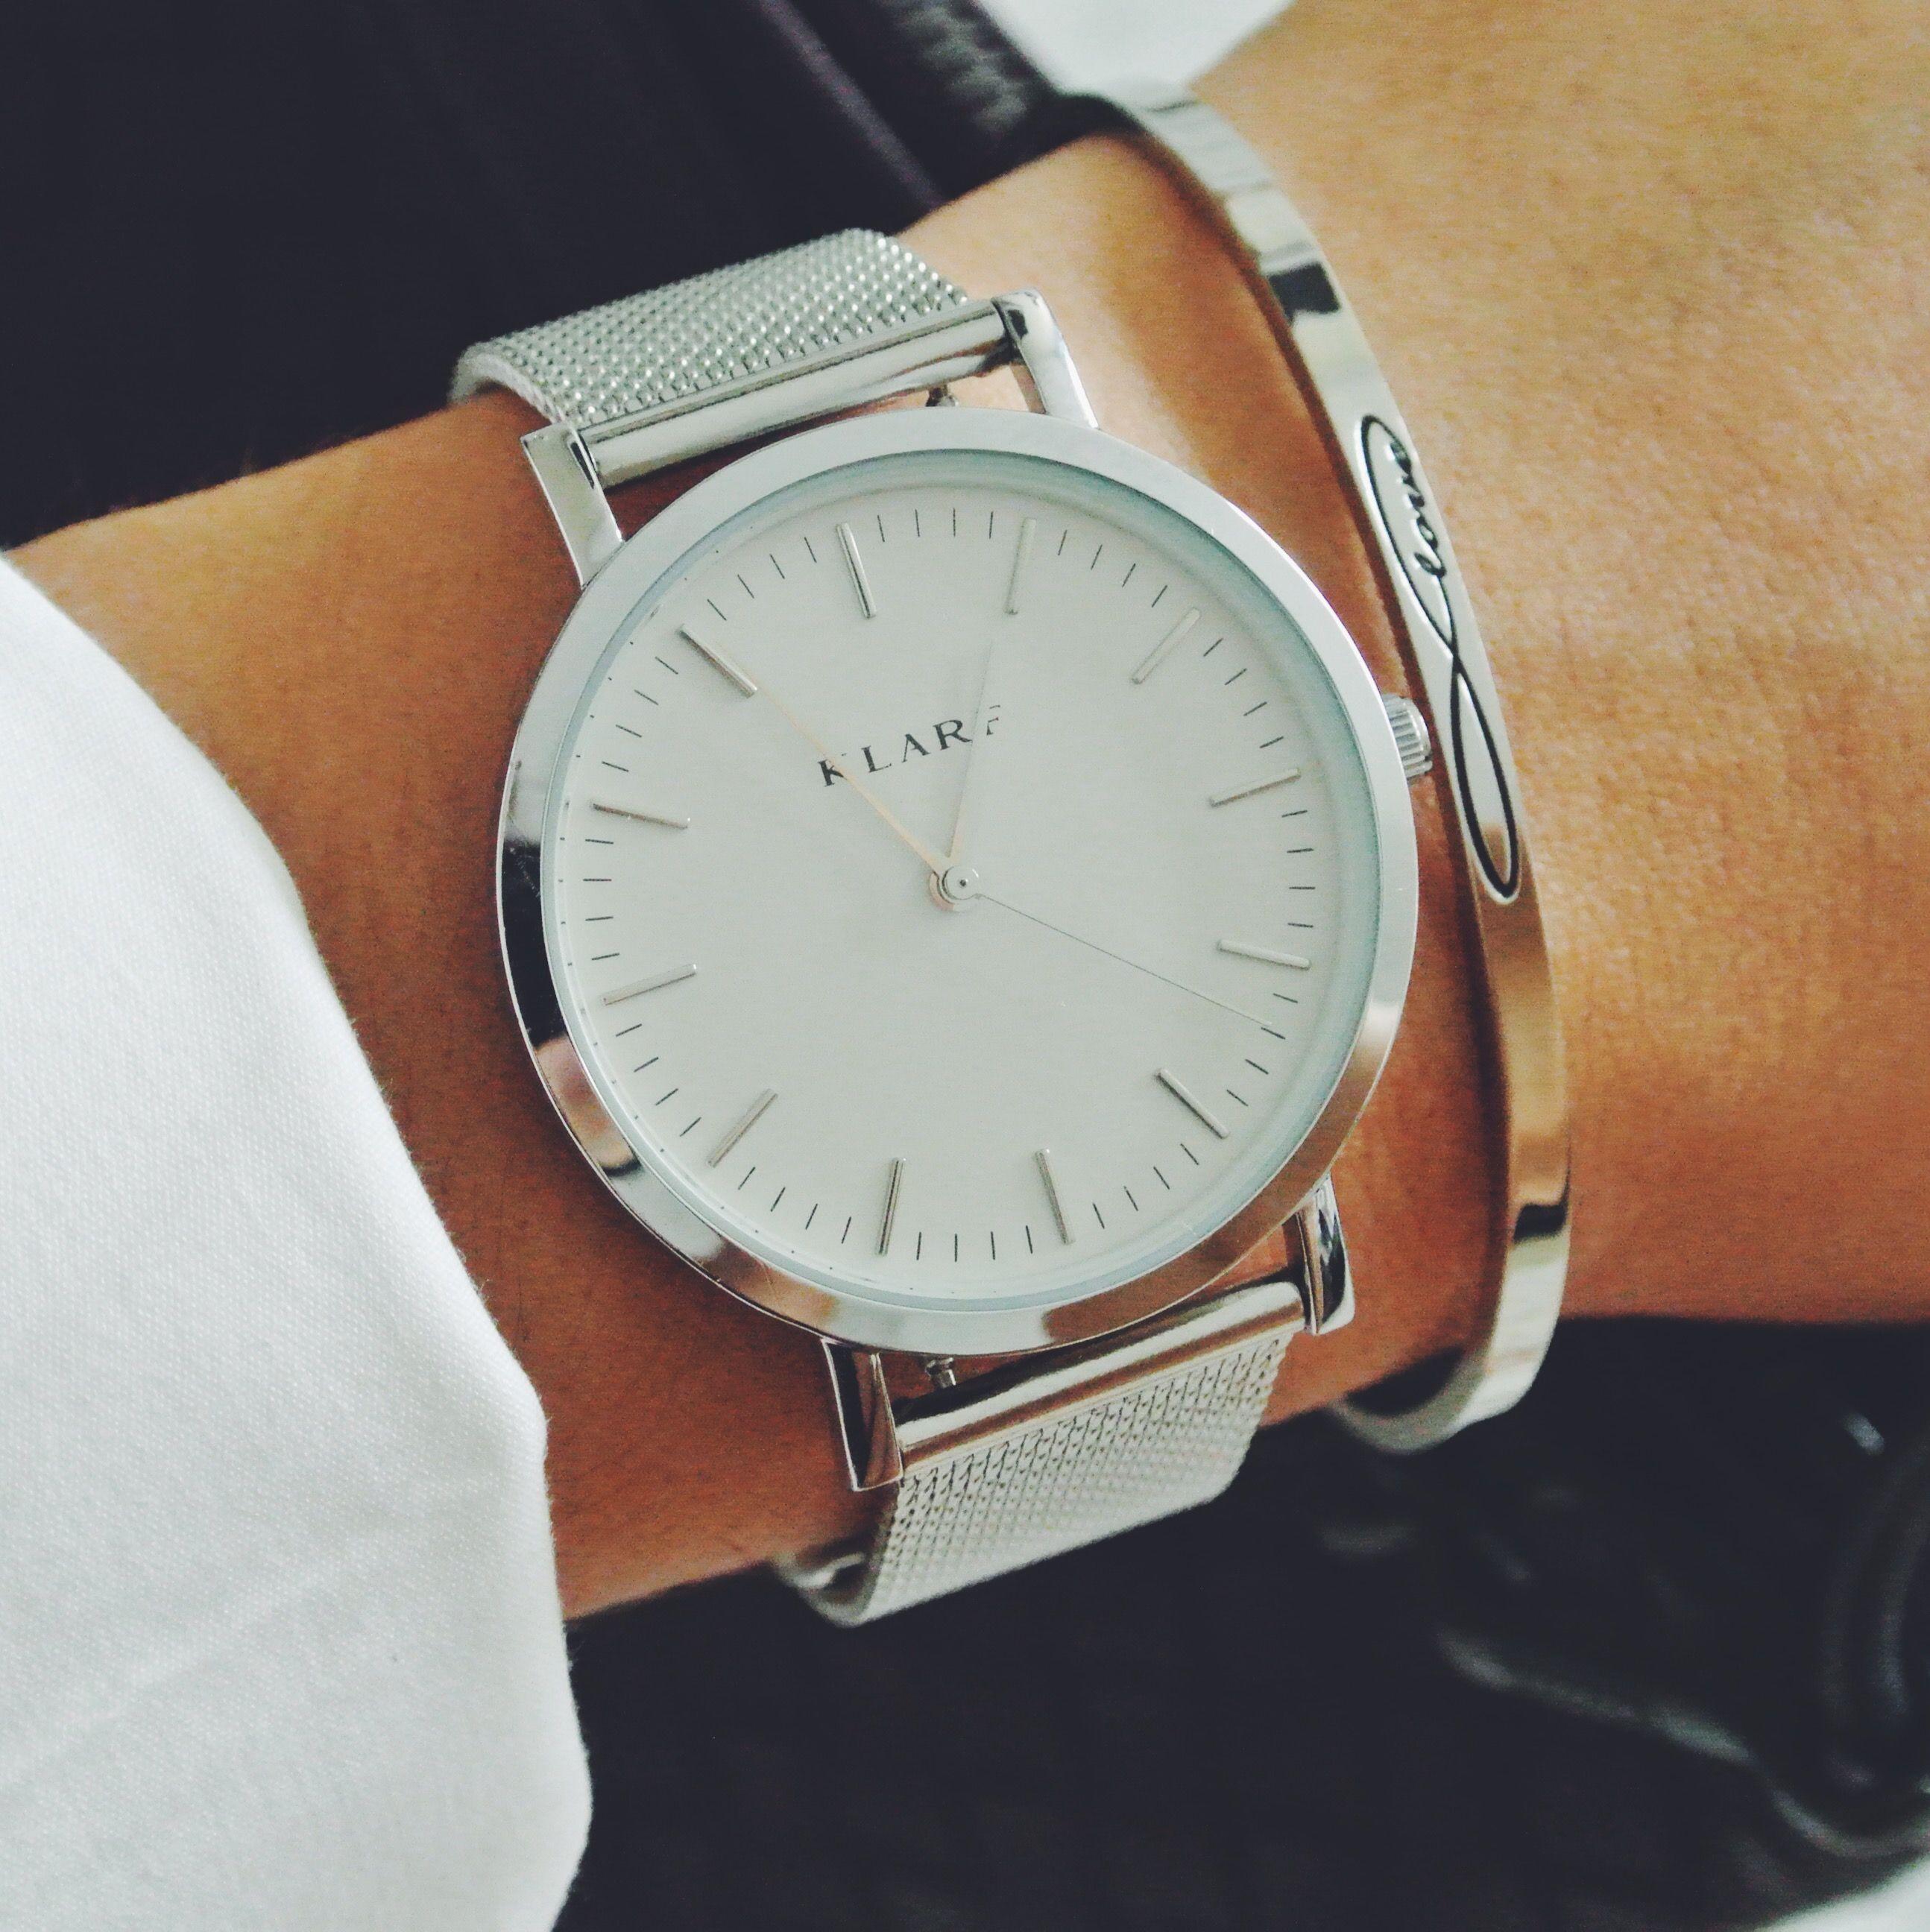 casio babyg � womens analoguedigital watch with resin